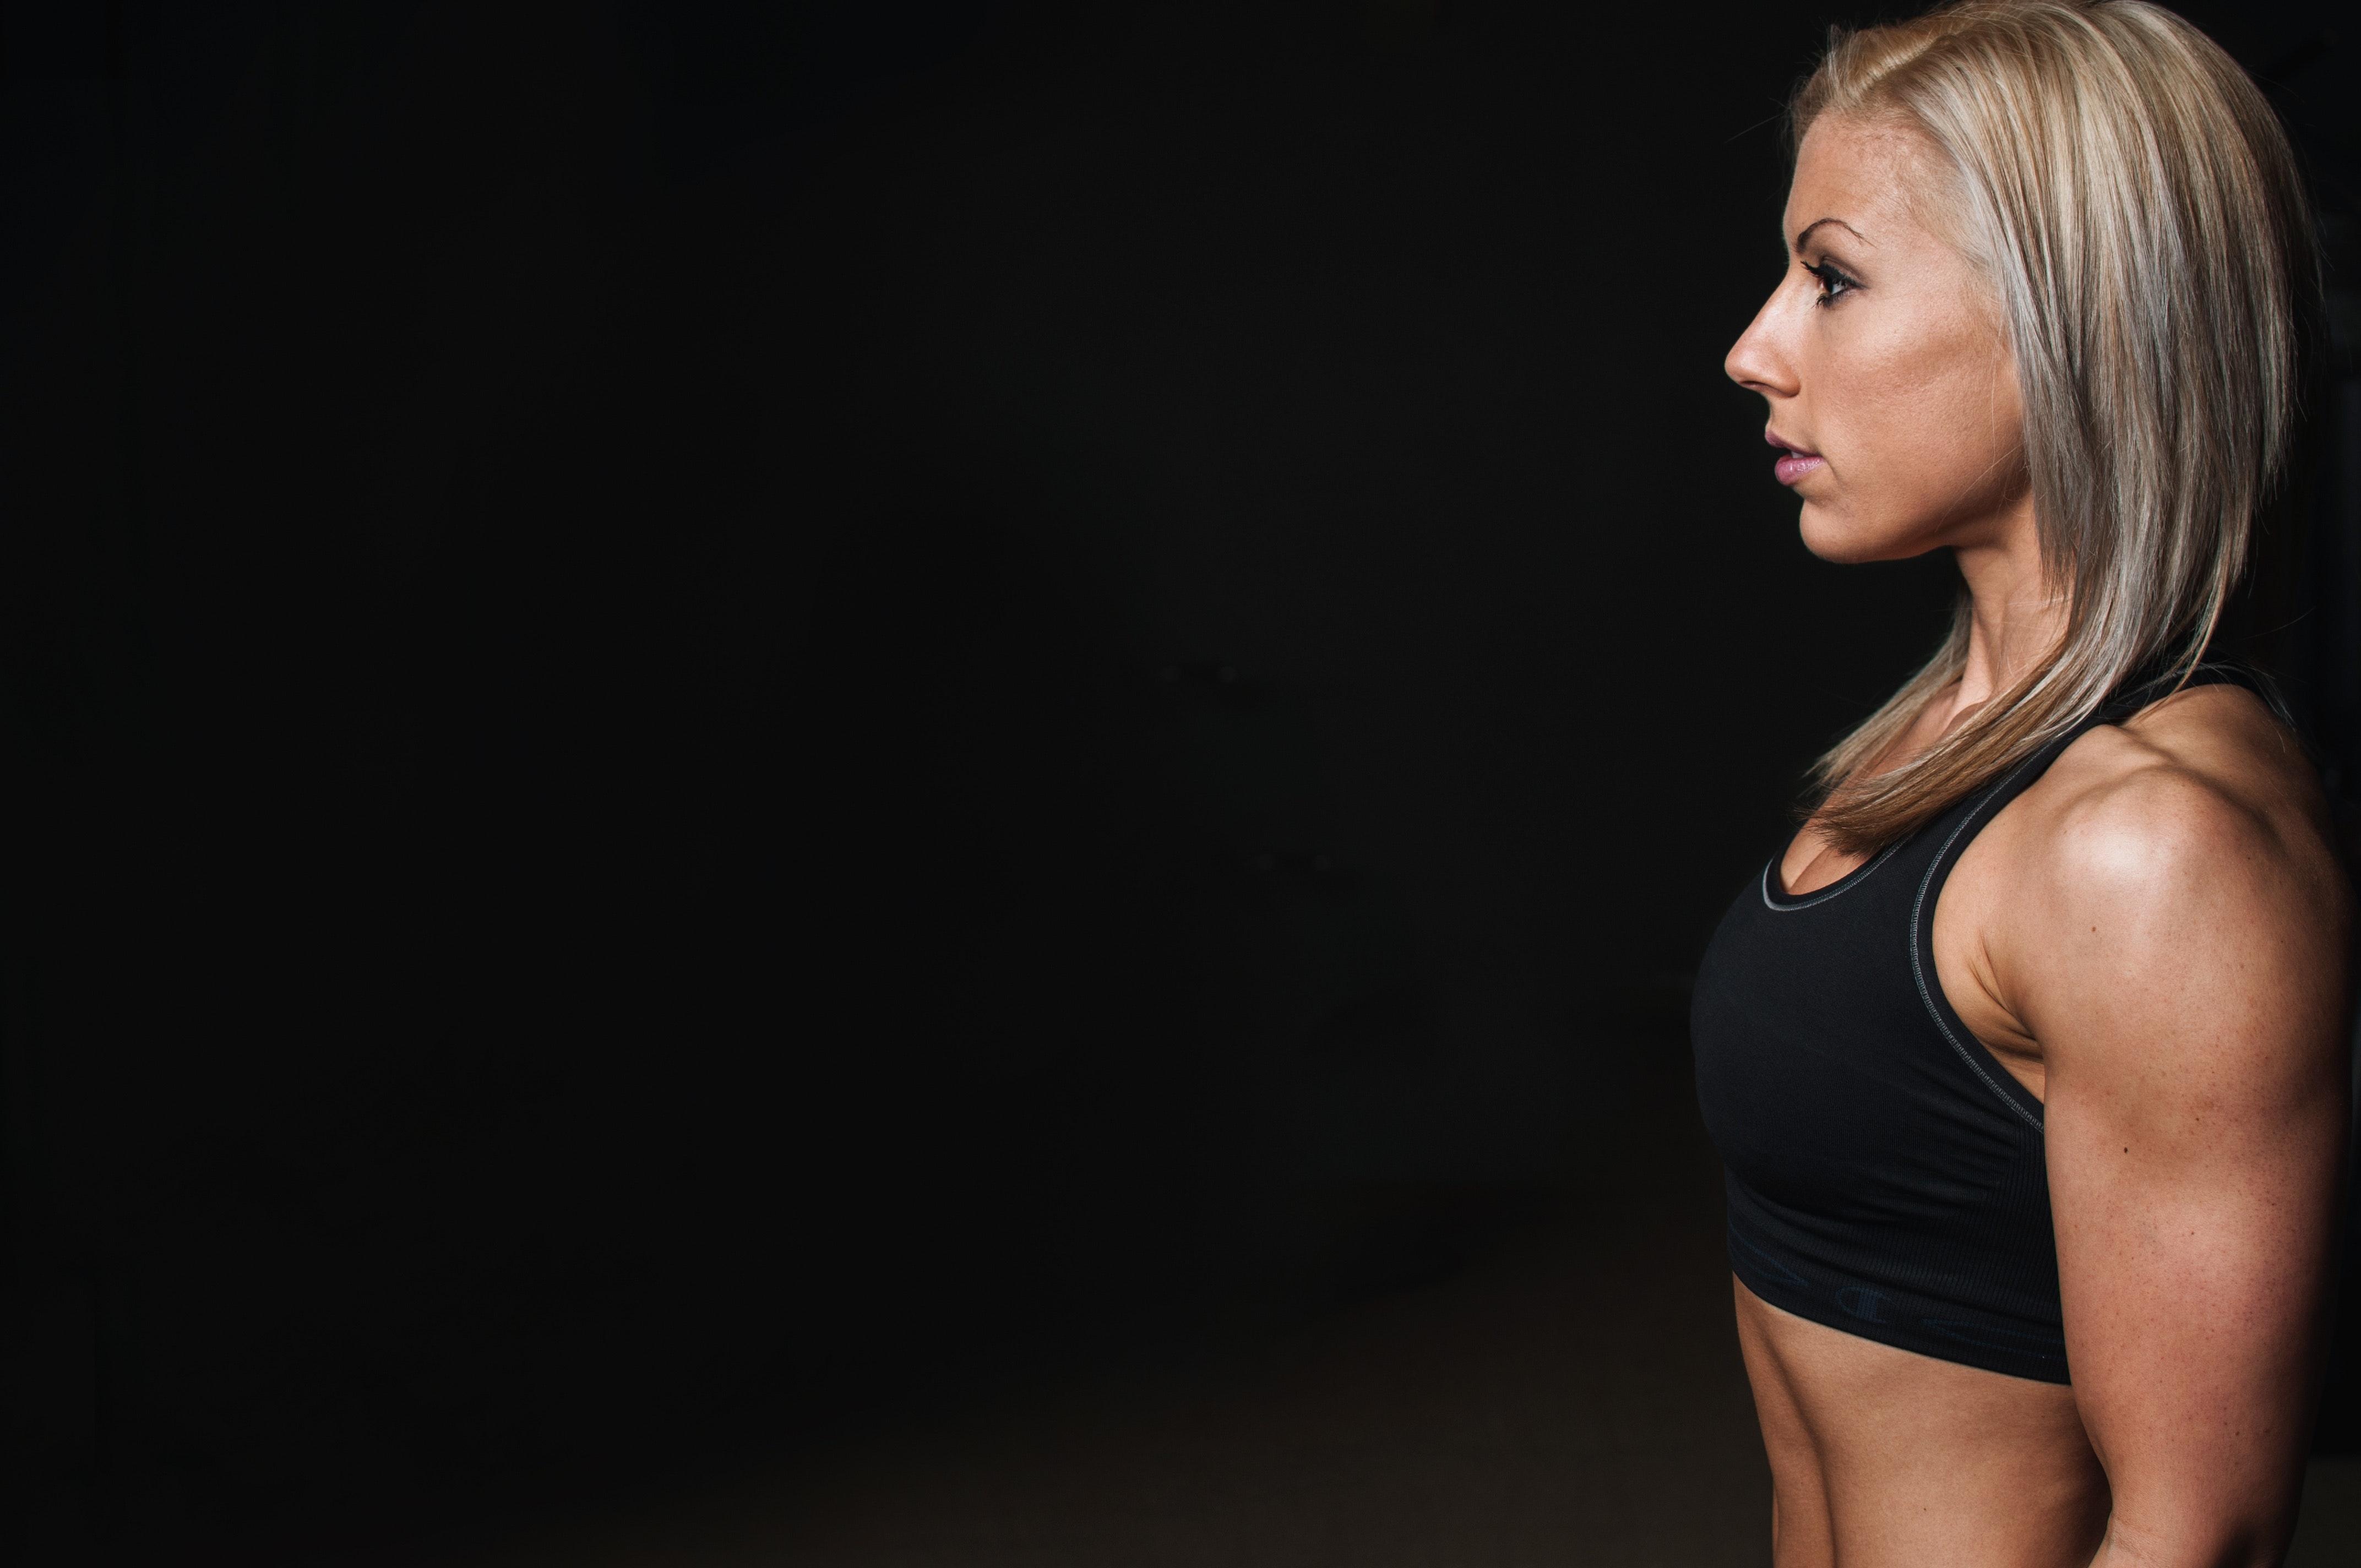 model-women-athlete-training-28054